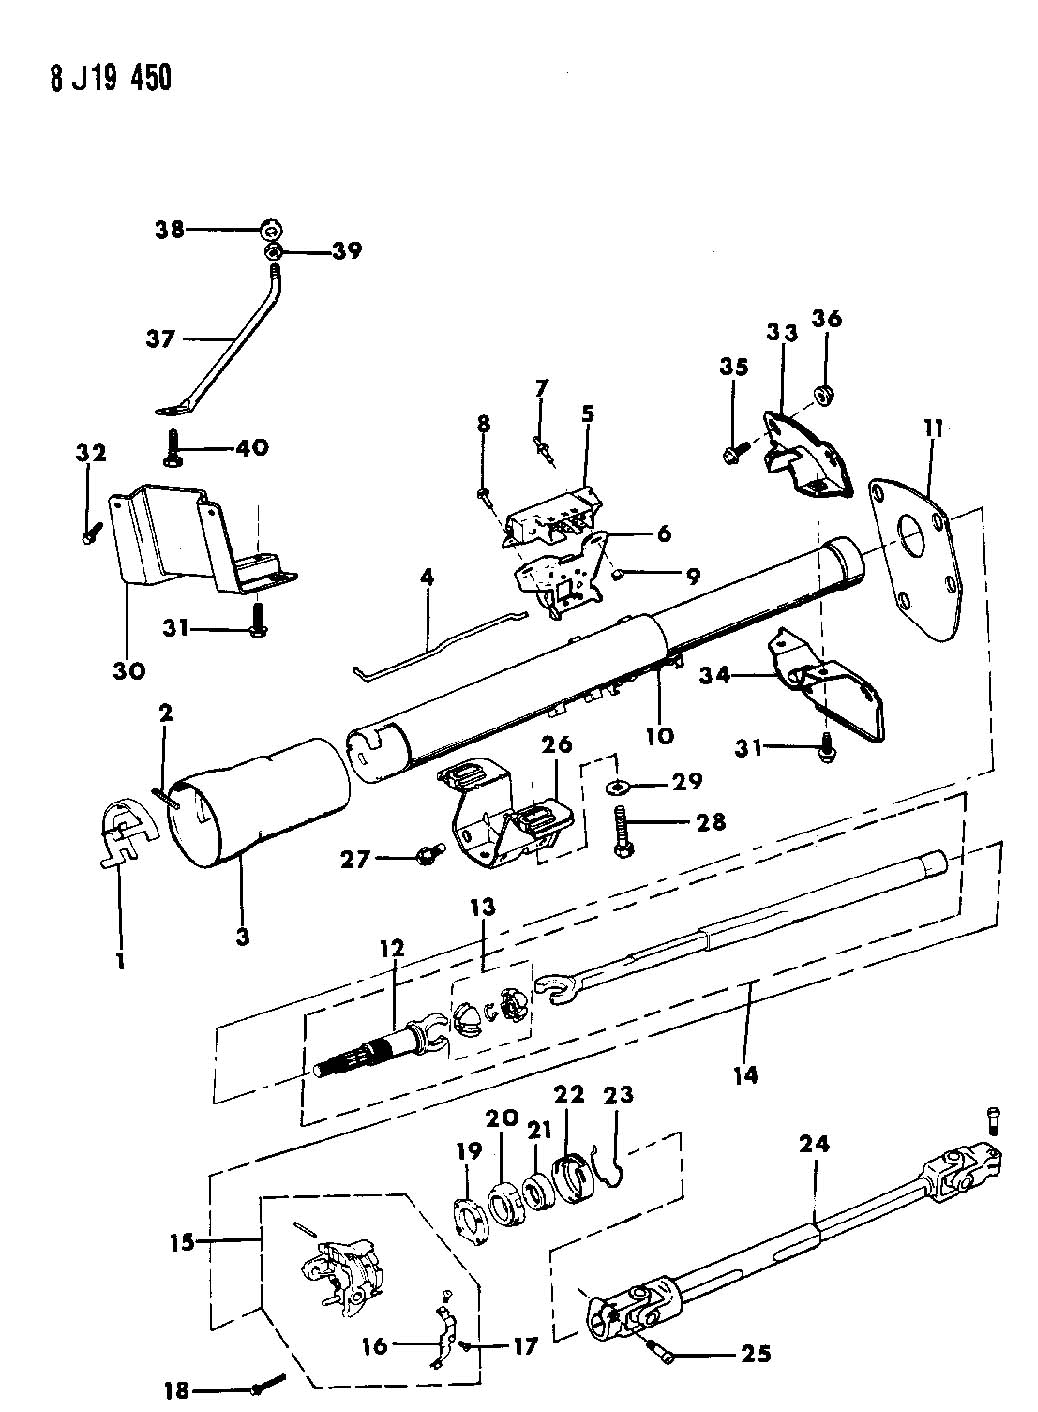 1986 jeep cj wiring diagram 1986 jeep cj wiring diagram jeep 1988 jeep